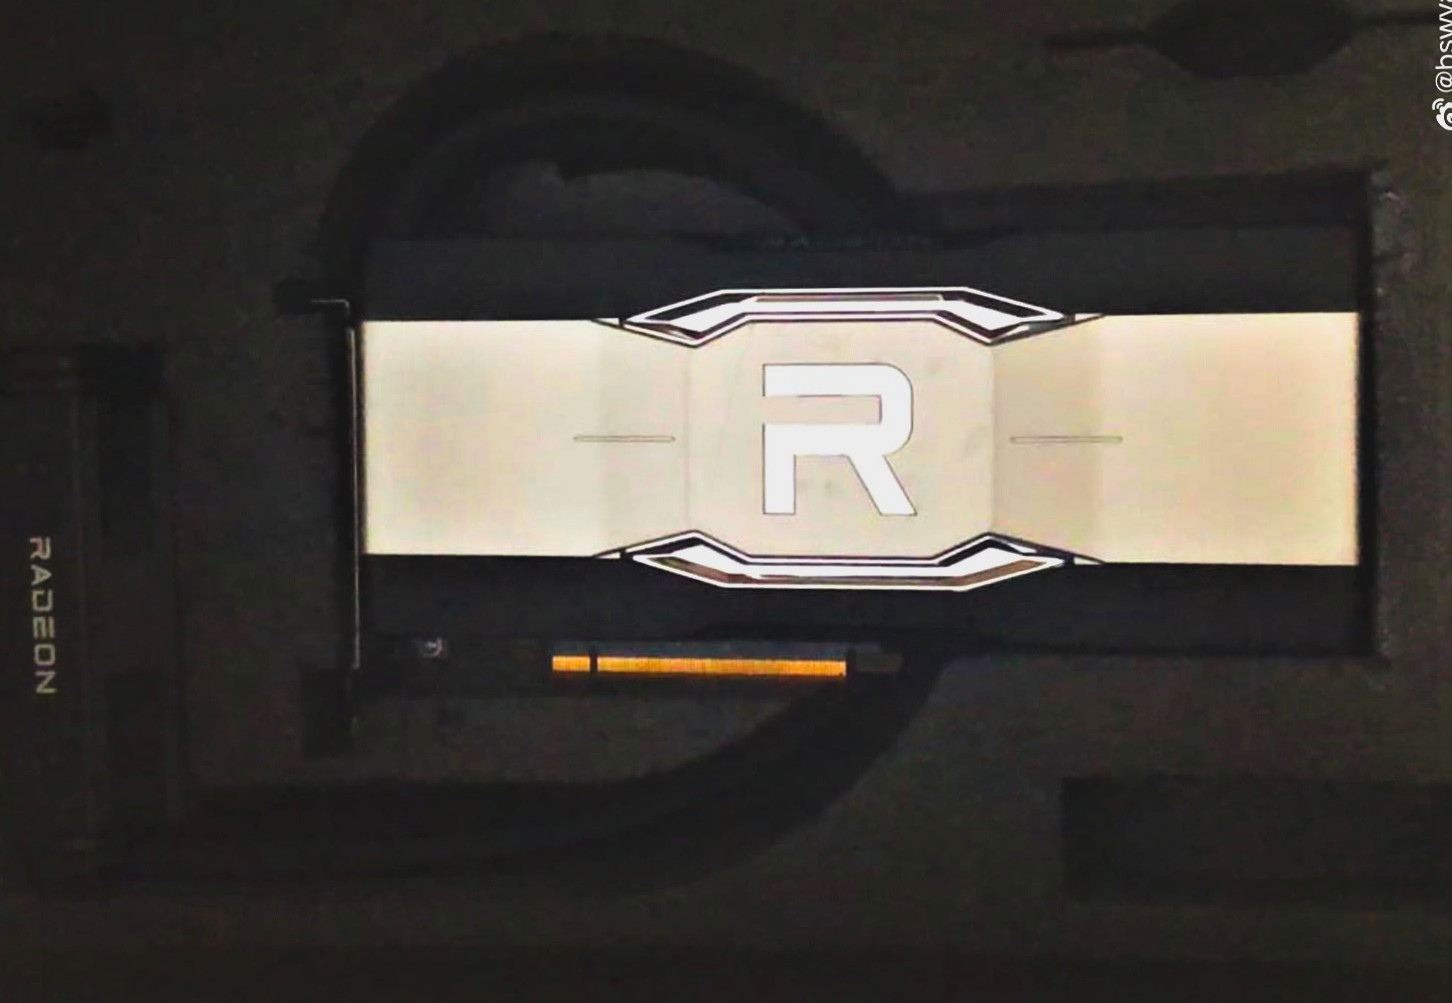 https://www.coolaler.com.tw/image/news/21/04/AMD-Radeon-RX-6900-XTX-Liquid-1.jpg